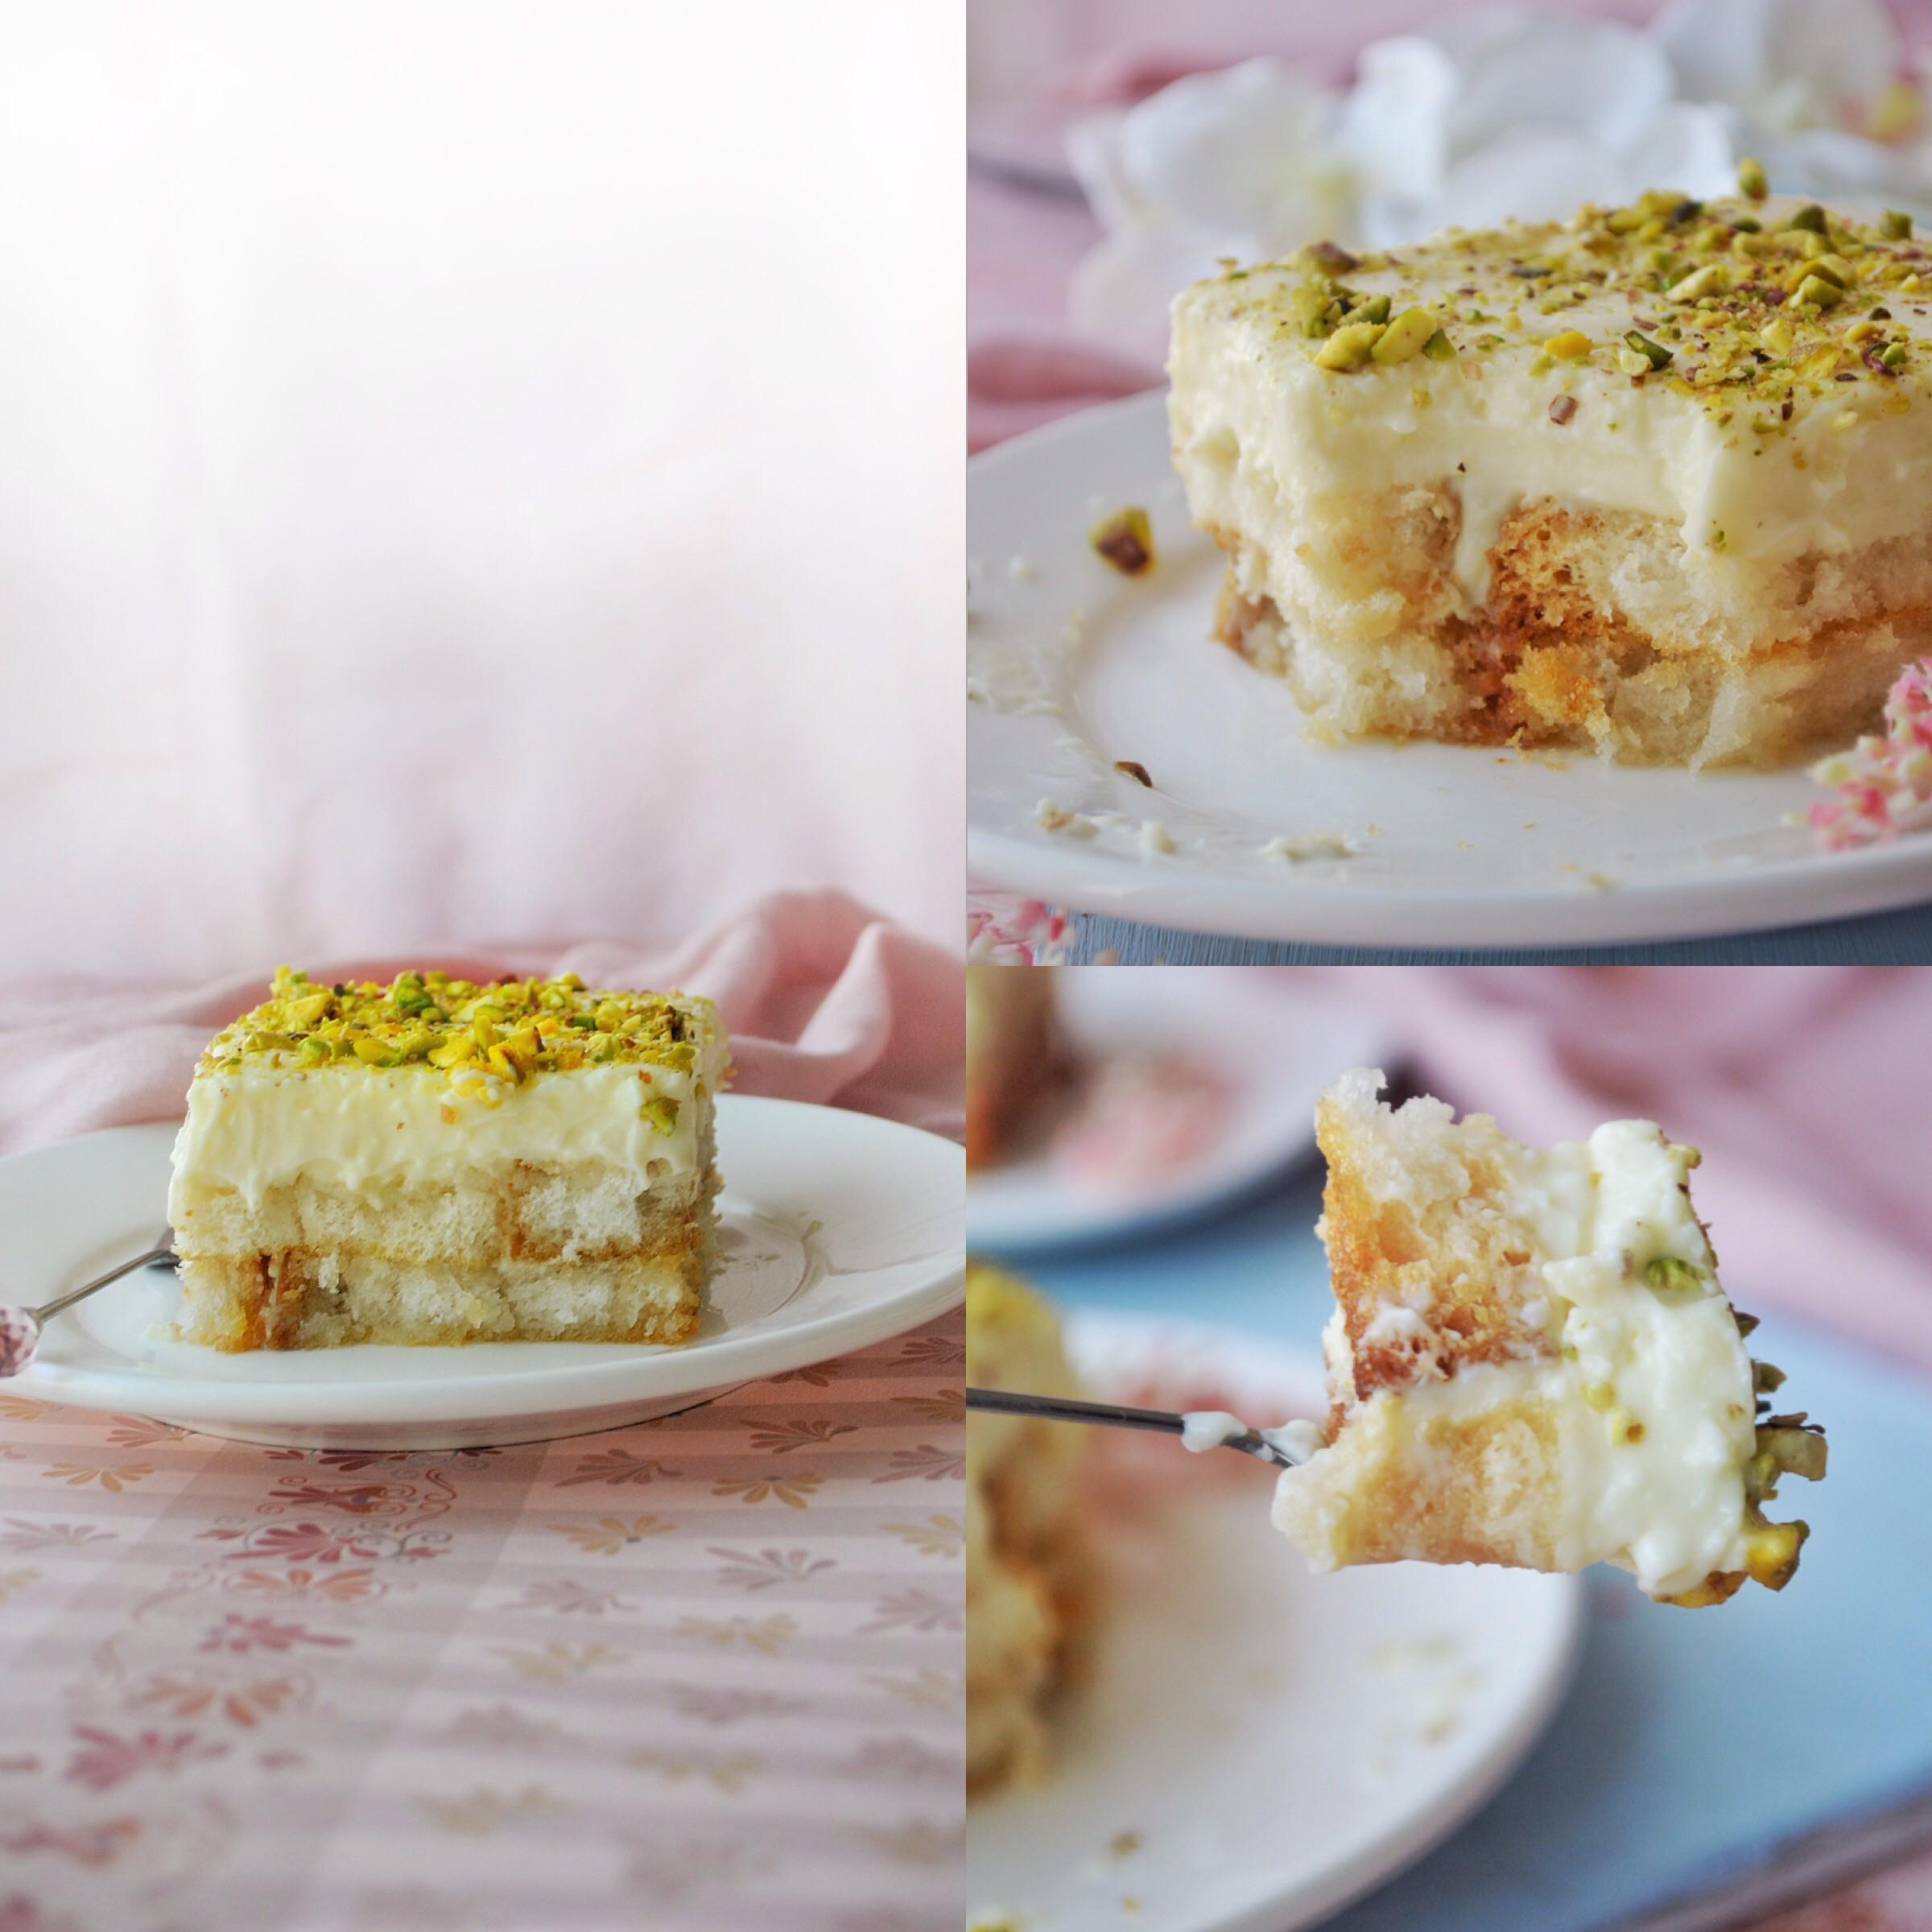 Middle Eastern Dessert Recipes  Aish el Saraya Middle Eastern Dessert Savory&SweetFood